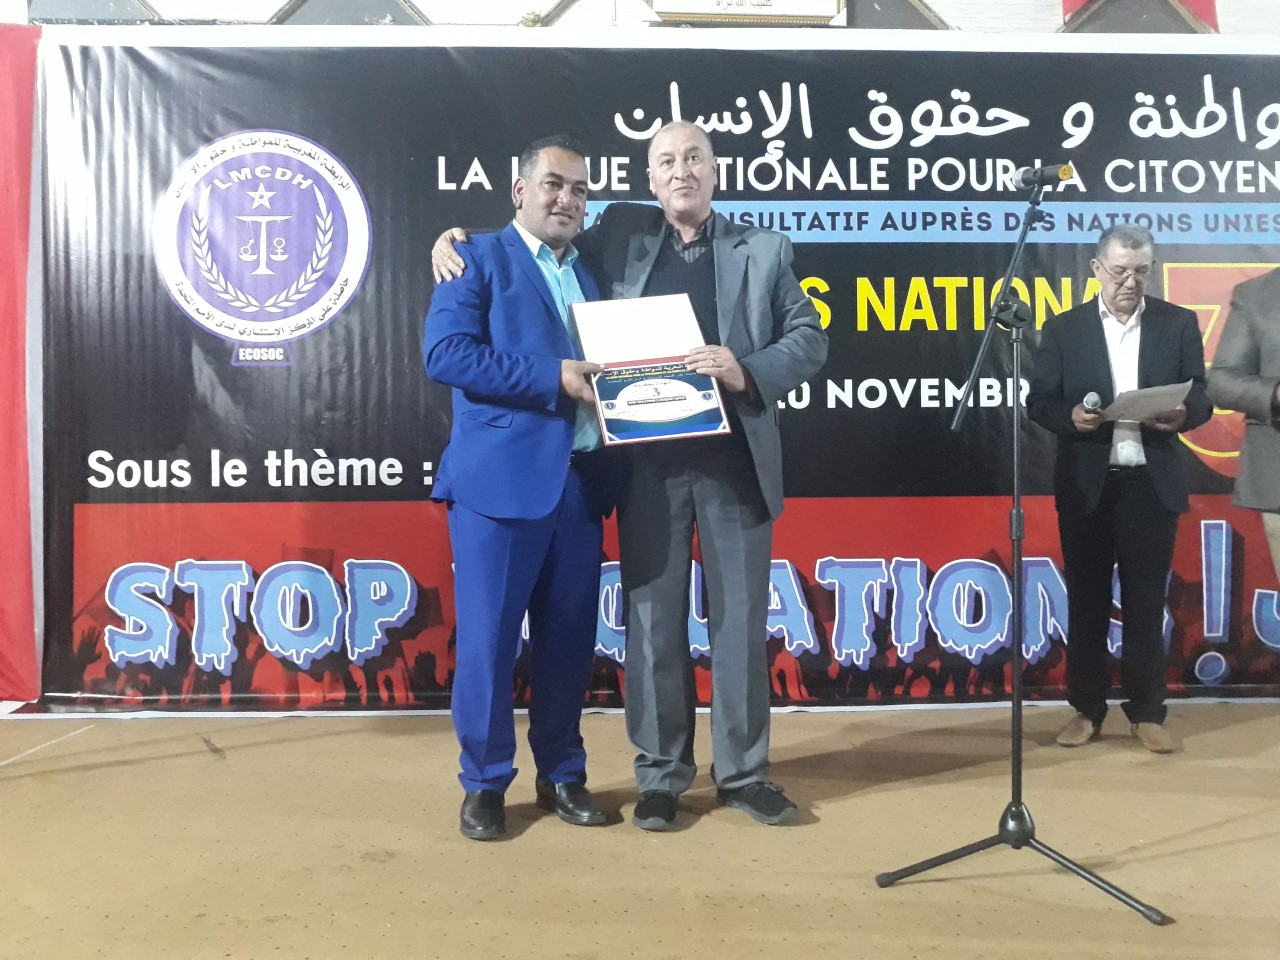 Photo of القنيطرة / السدراوي رئيسا للرابطة المغربية  للمواطنة وحقوق الإنسان